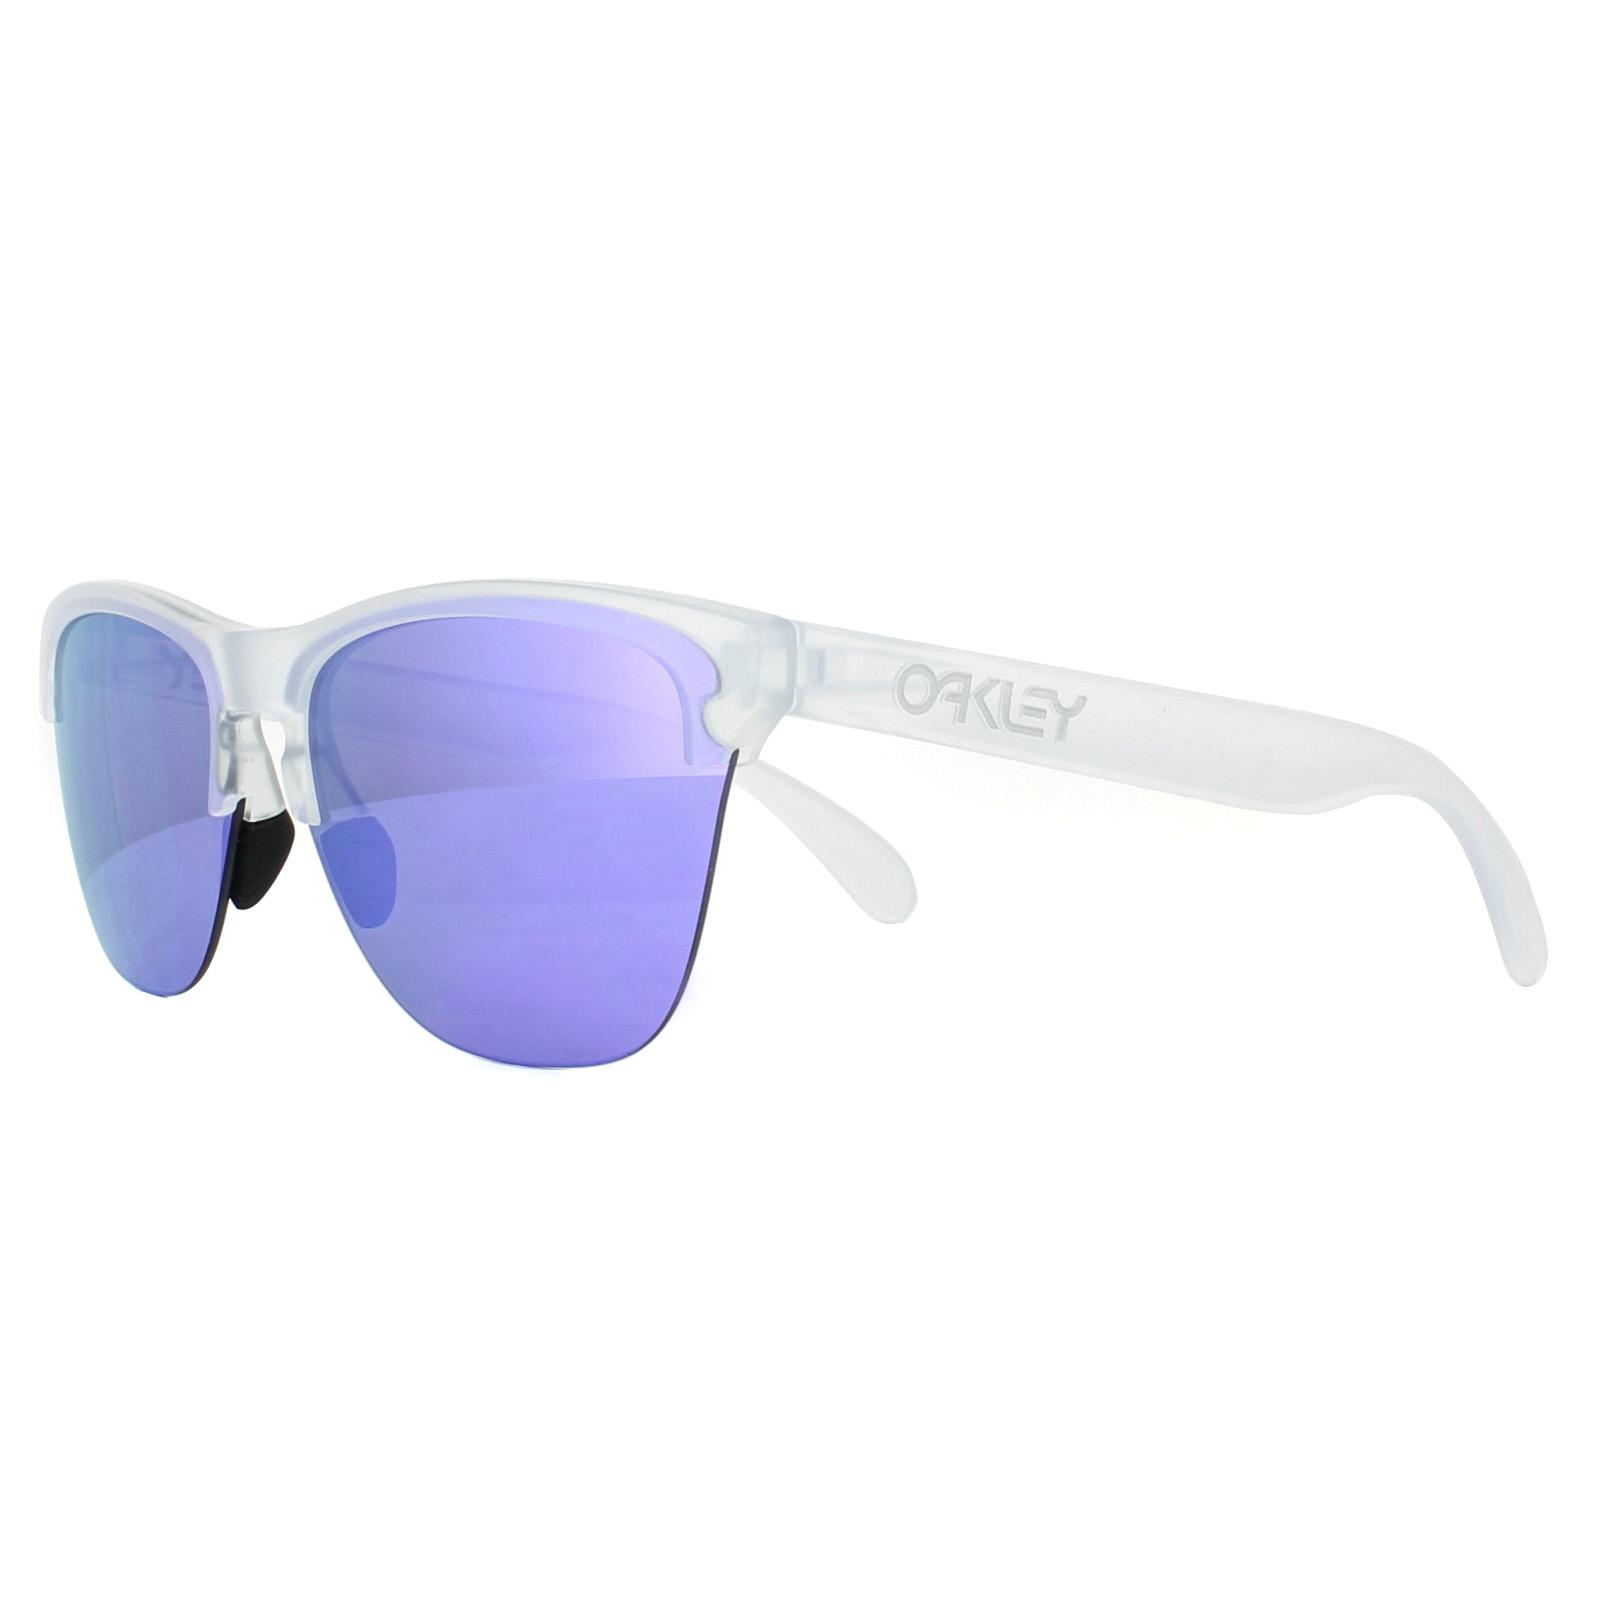 85c20b0cef Sentinel Oakley Sunglasses Frogskins Lite OO9374-03 Matt Clear Violet  Iridium